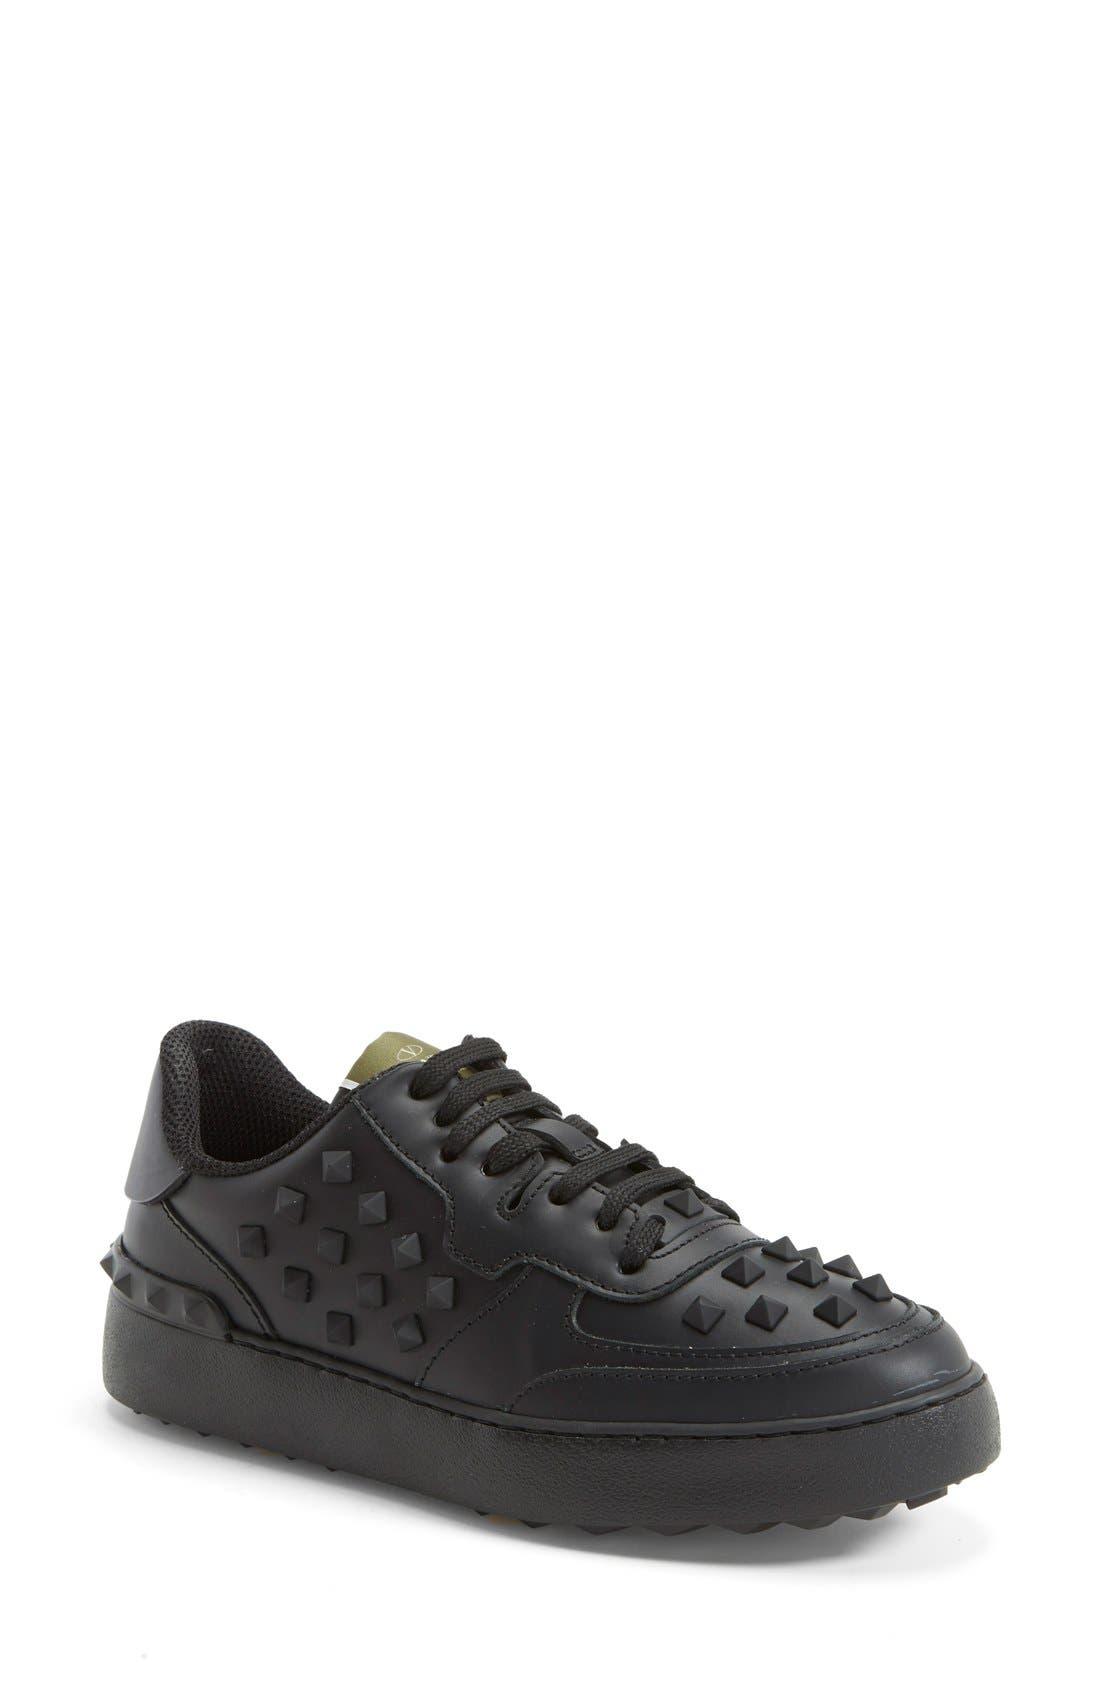 Alternate Image 1 Selected - Valentino 'Rock Be' Sneaker (Women)